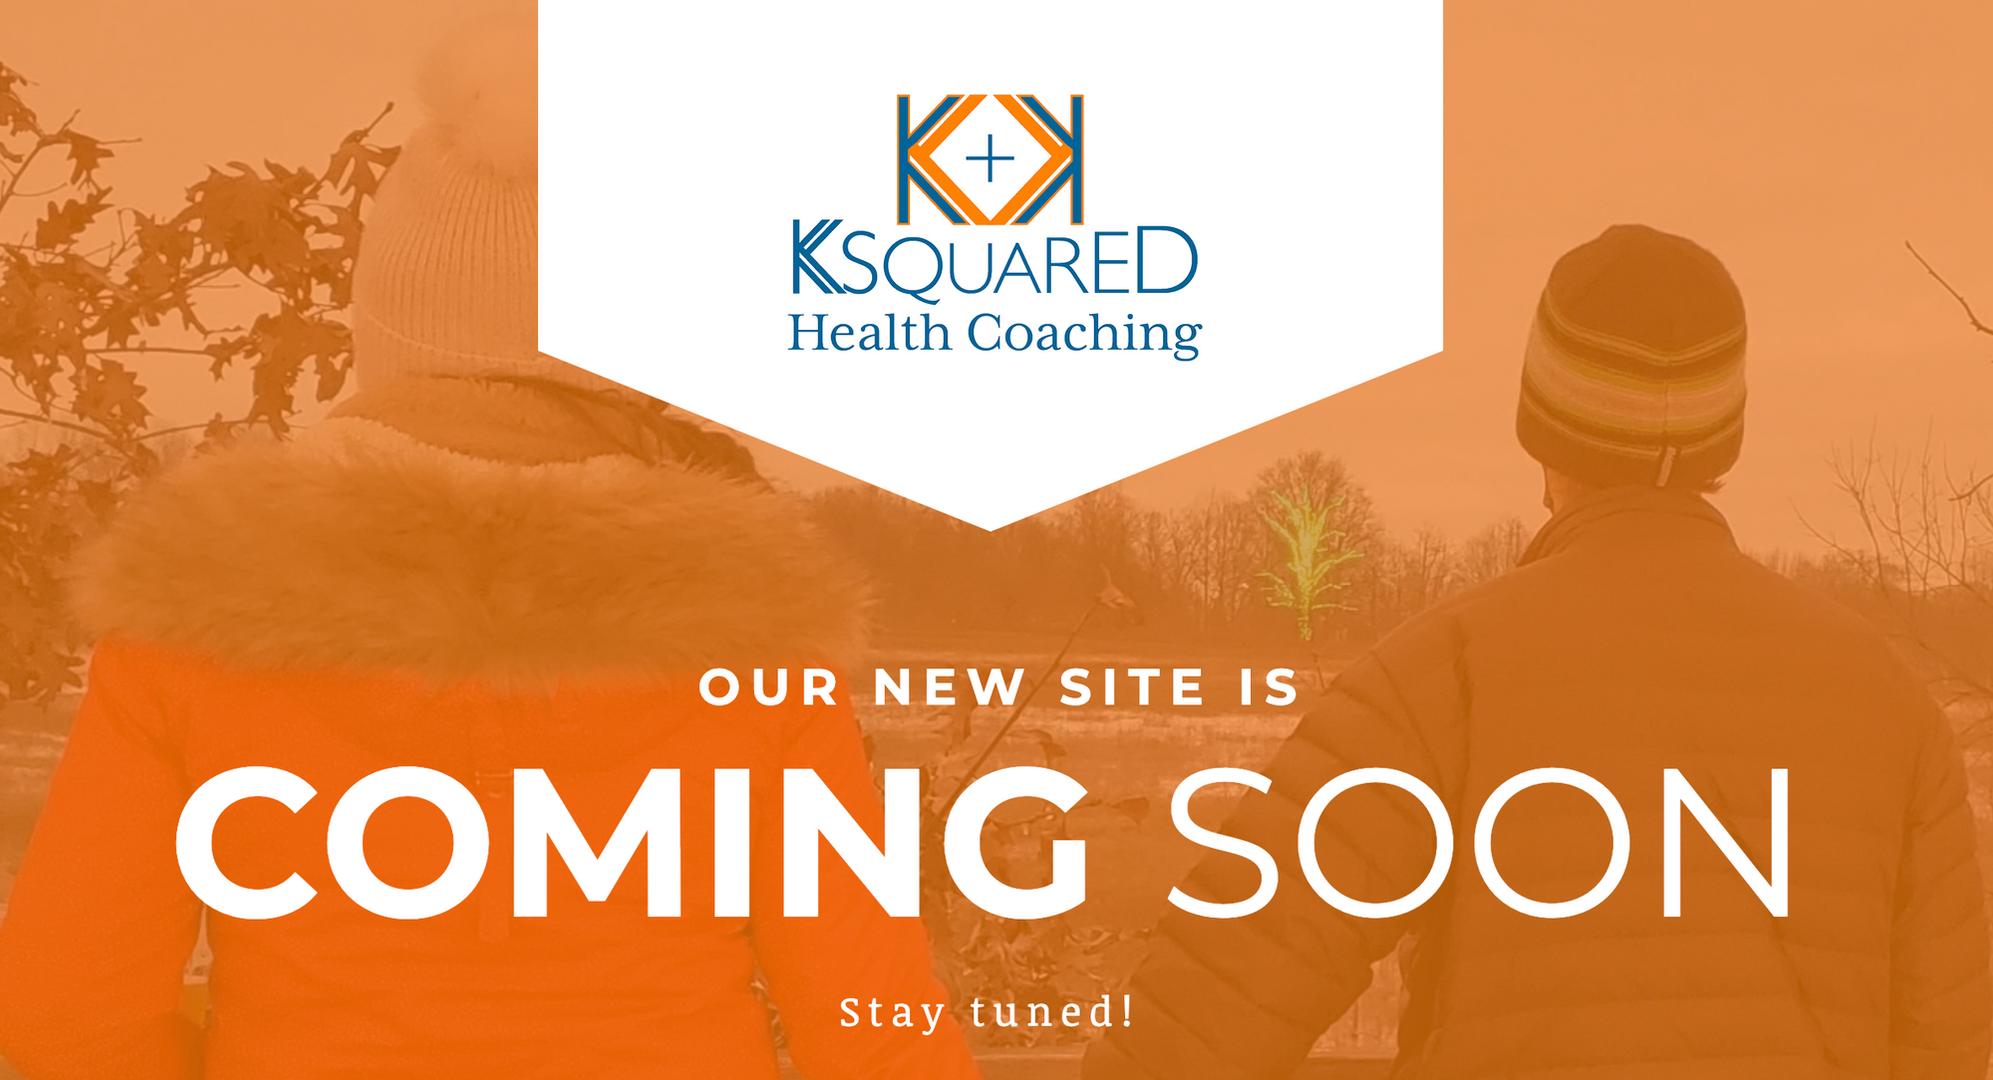 KSquared Health Coaching Website